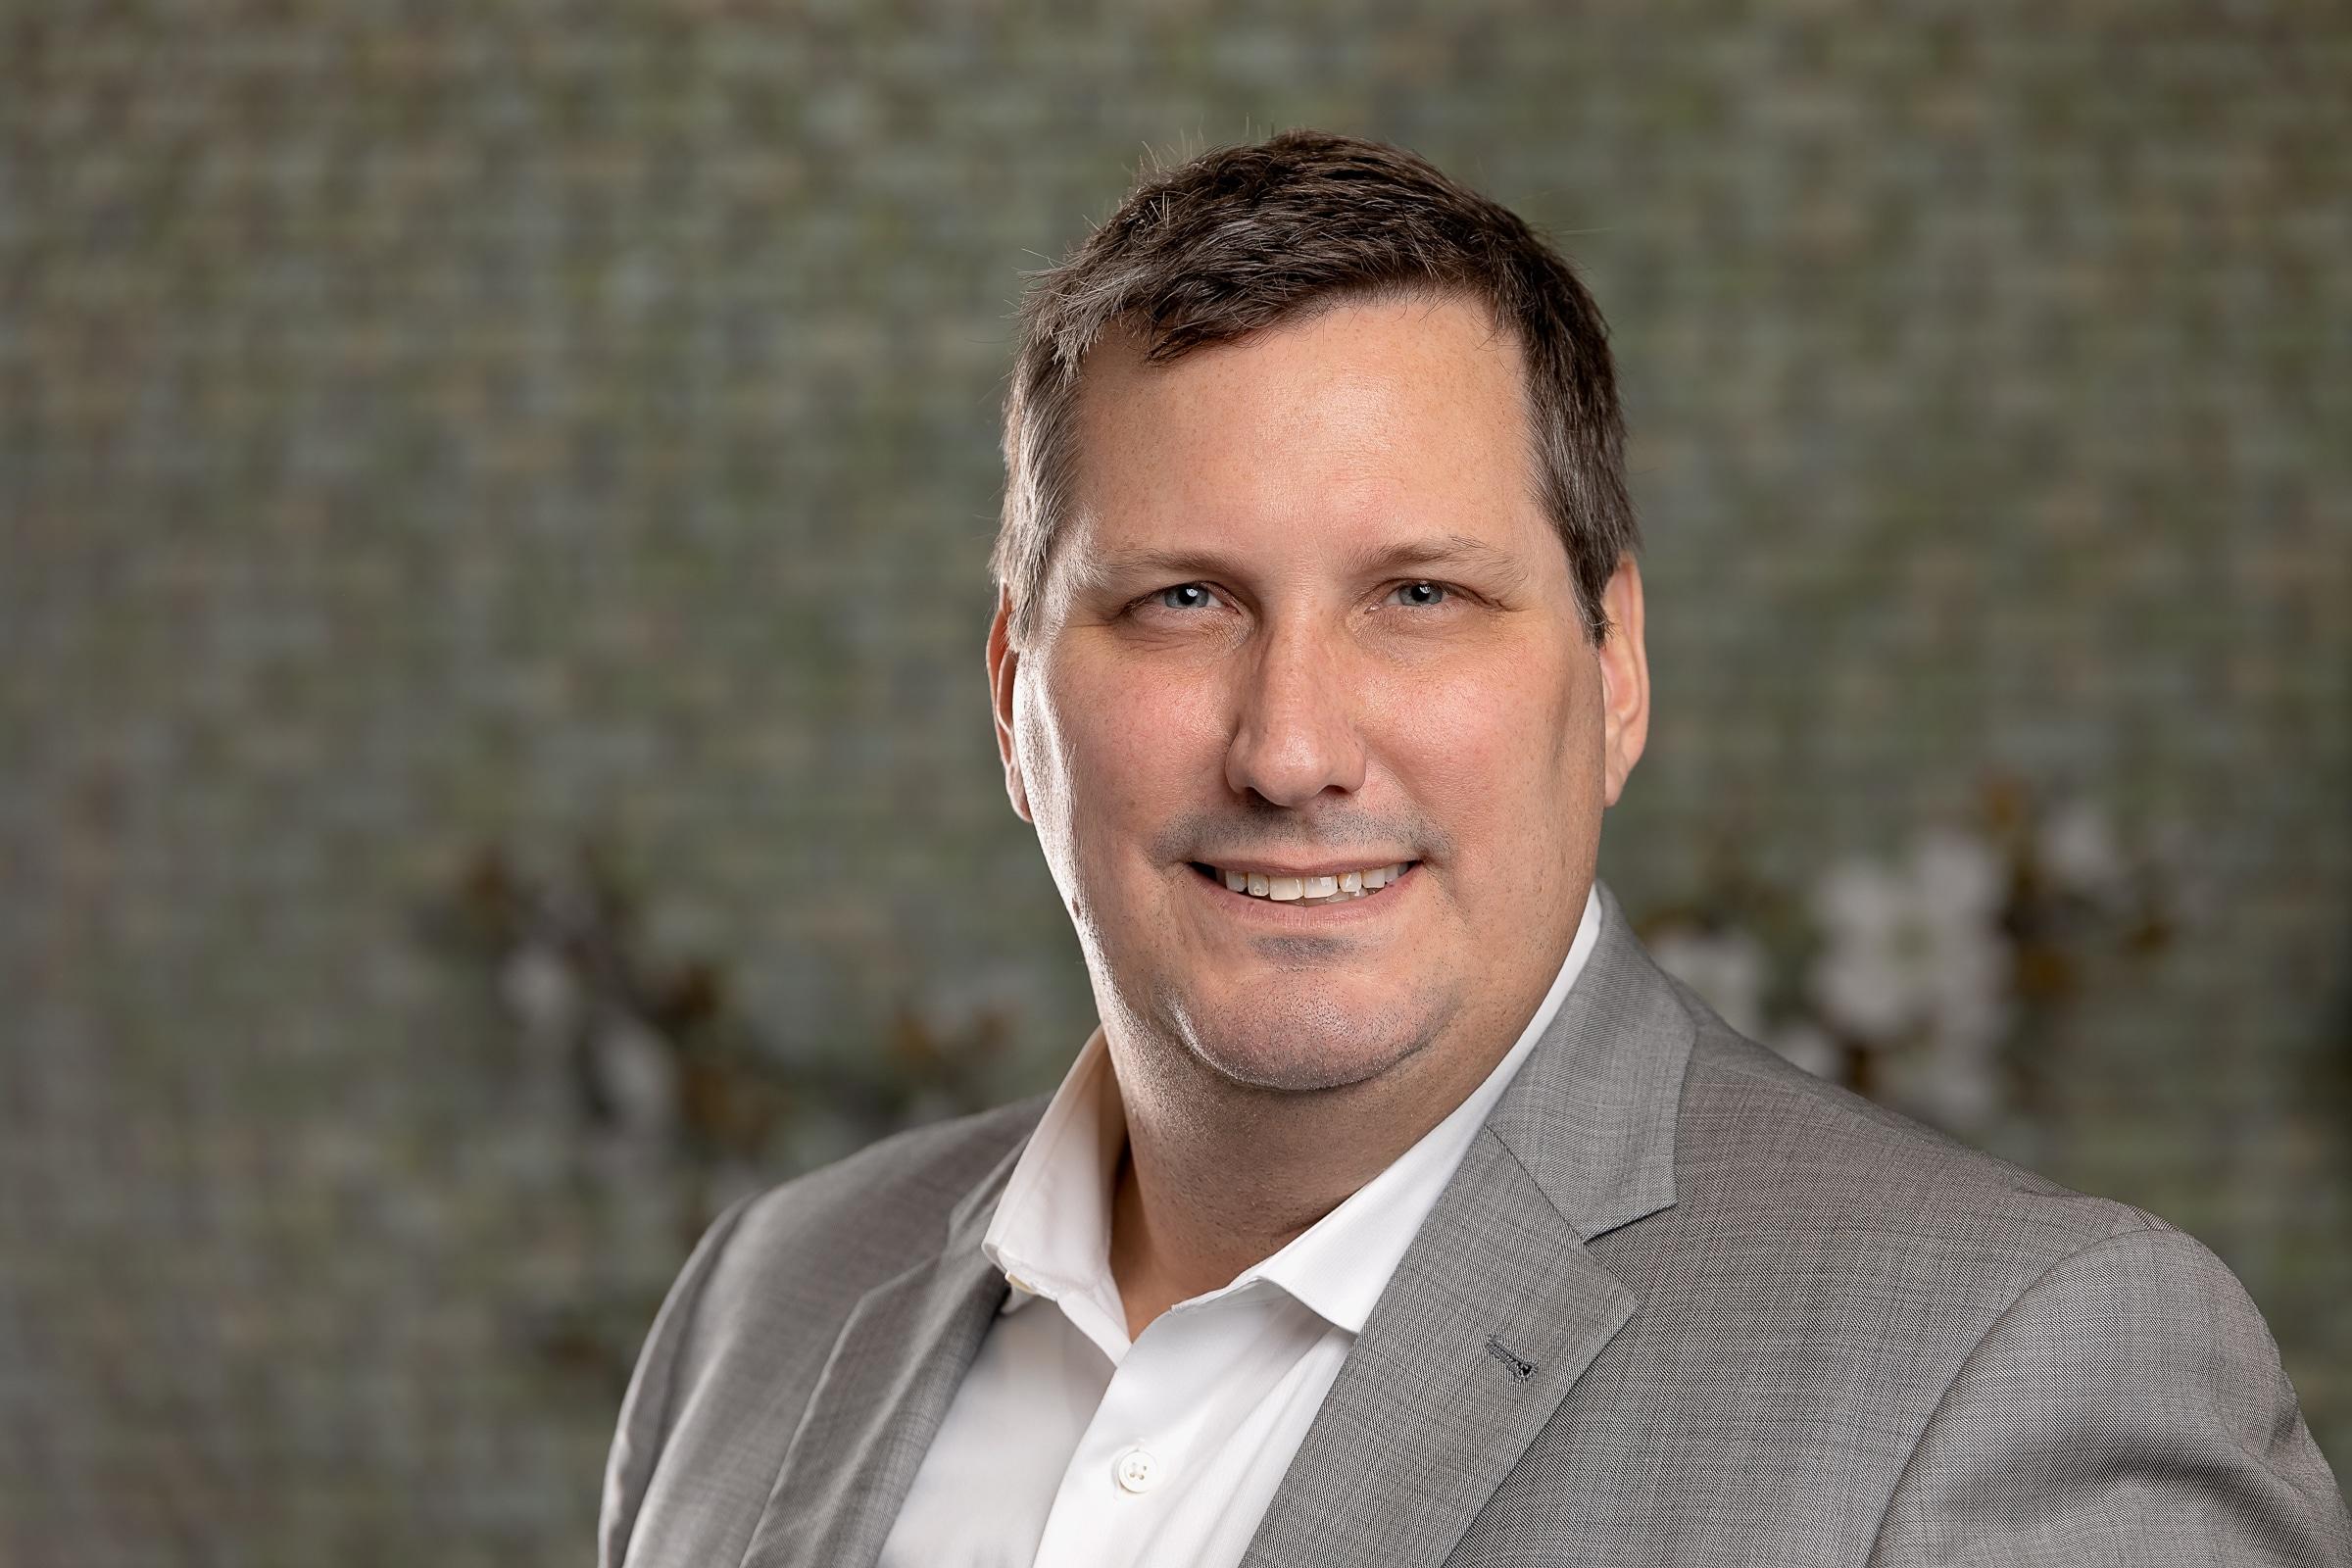 Greg-Tutko-RN-MBA Greg Tutko, RN, MBANational Sales Director for Respiratory Altus Biologics